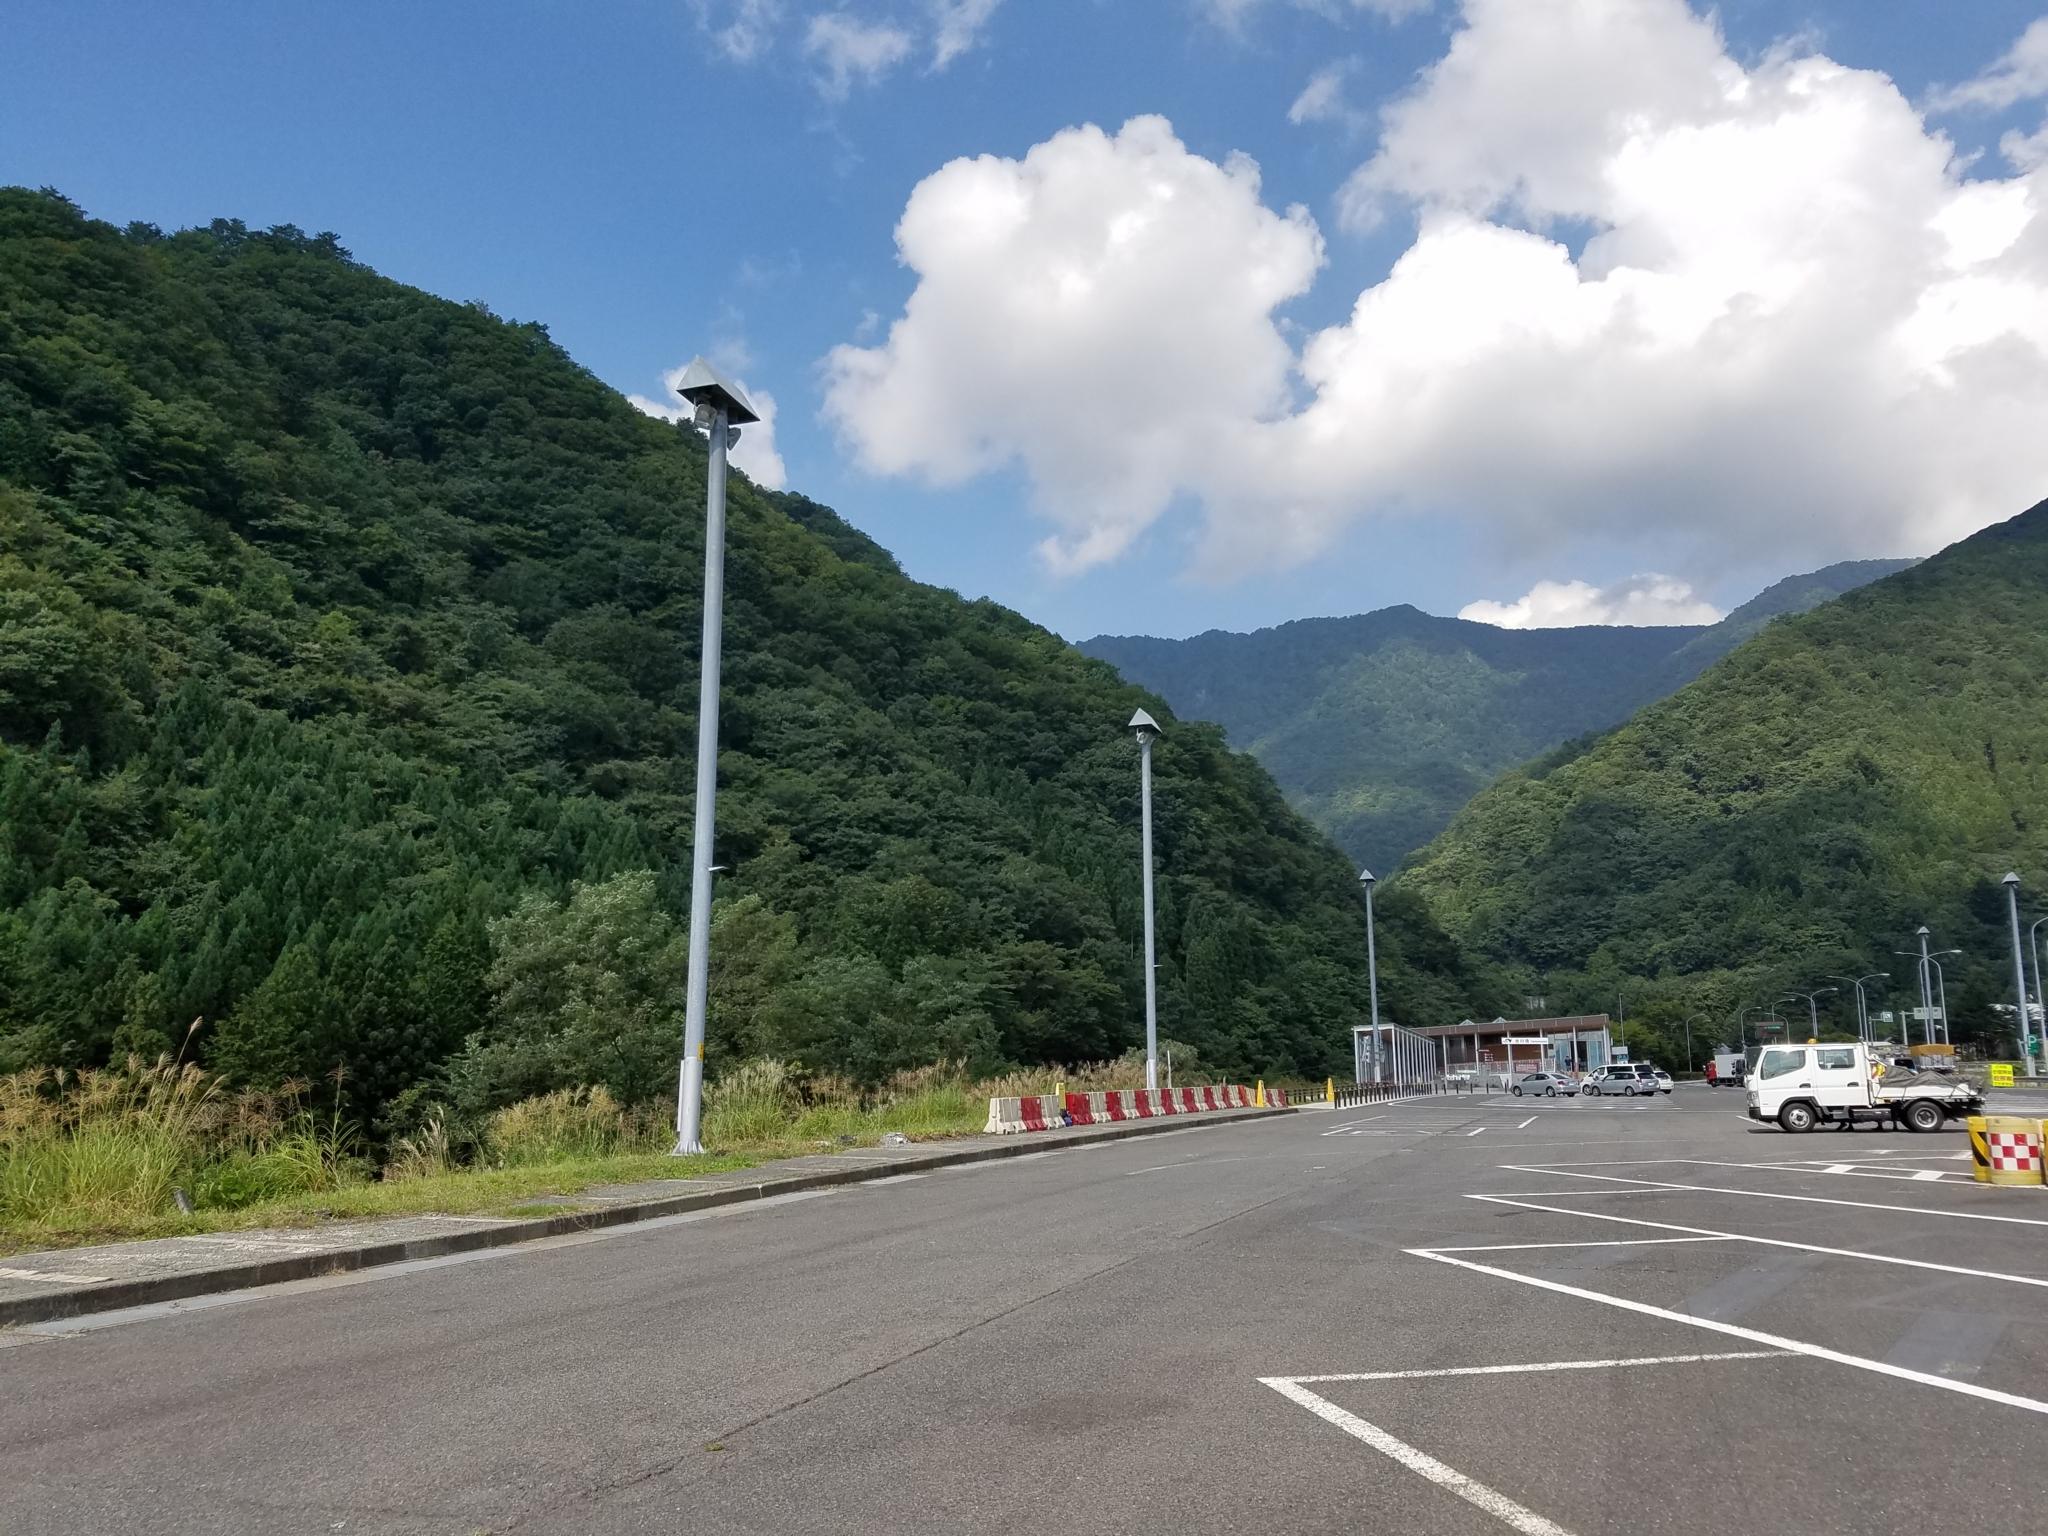 f:id:ToshUeno:20160902093025j:plain